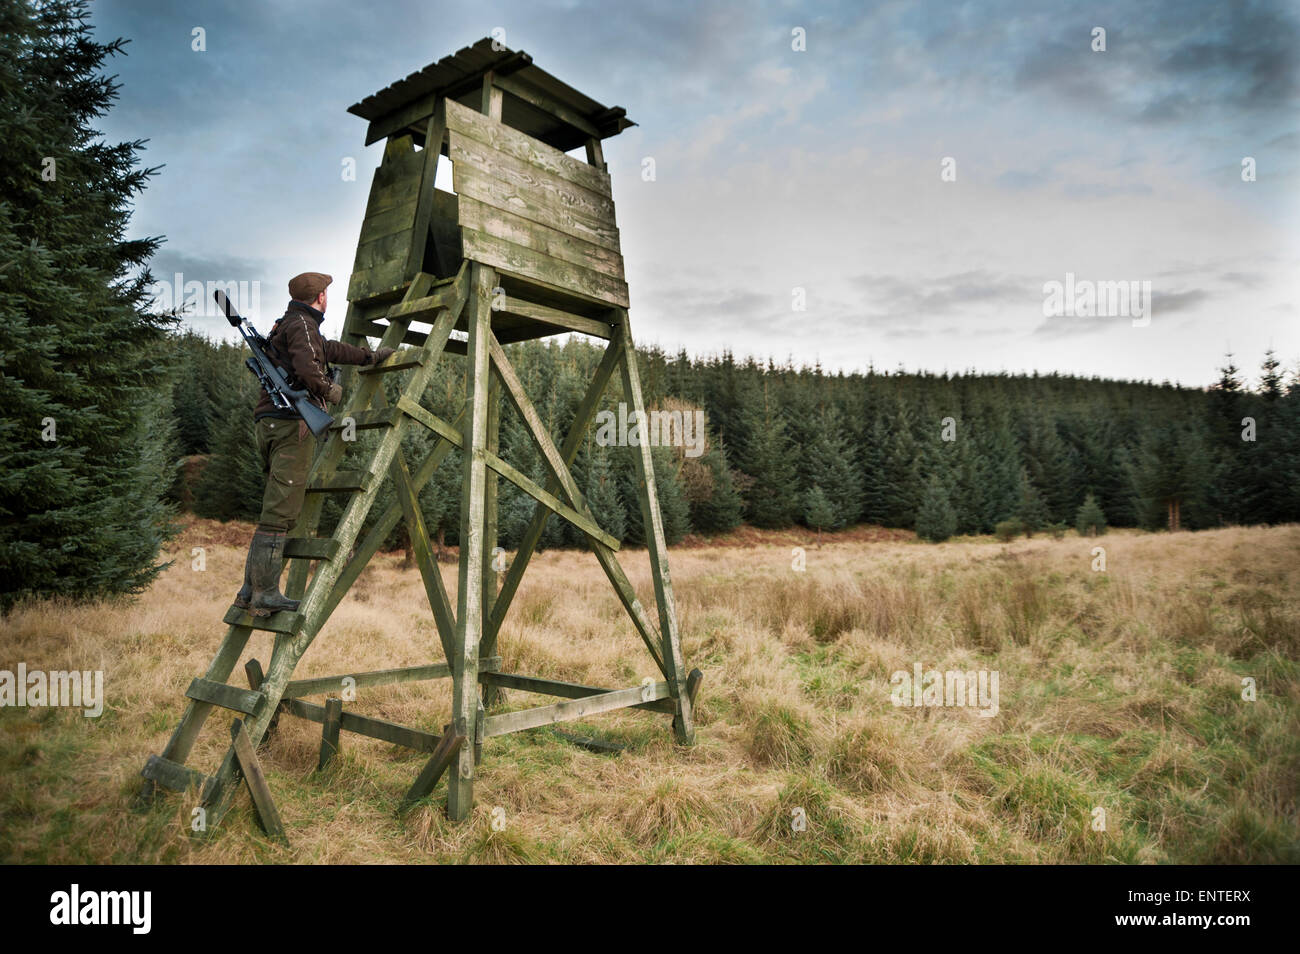 A hunter or deer stalker climbs up a high seat wildlife hide, Scotland, UK - Stock Image